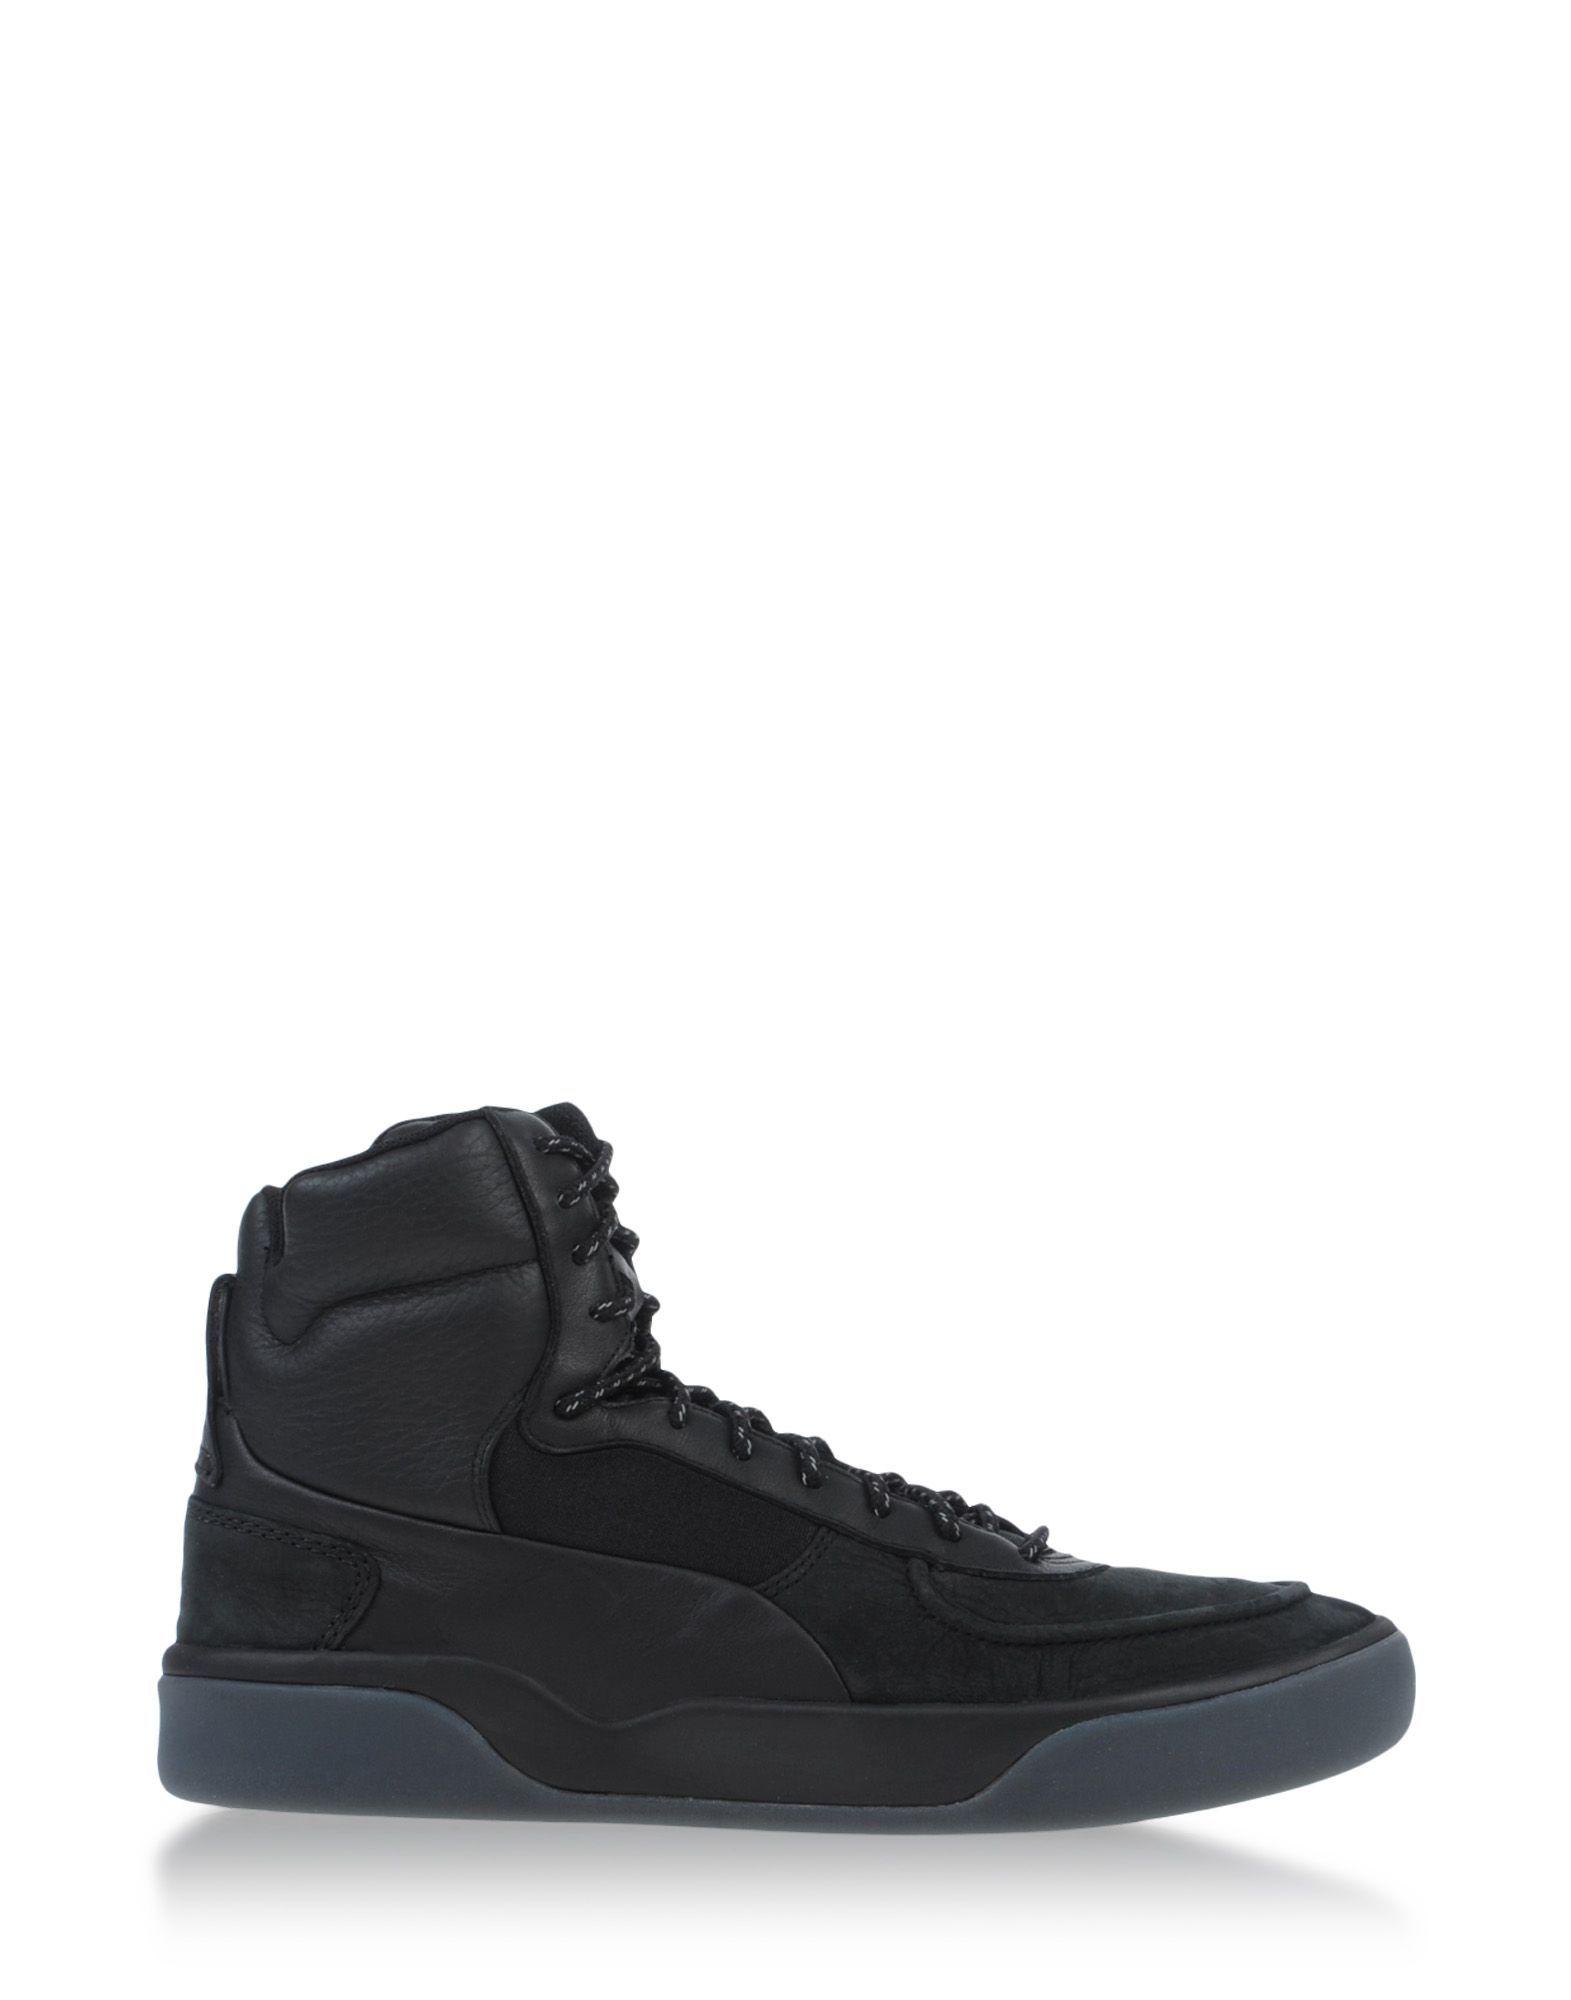 puma leather trainers cheap   OFF74% Discounted dda67e952